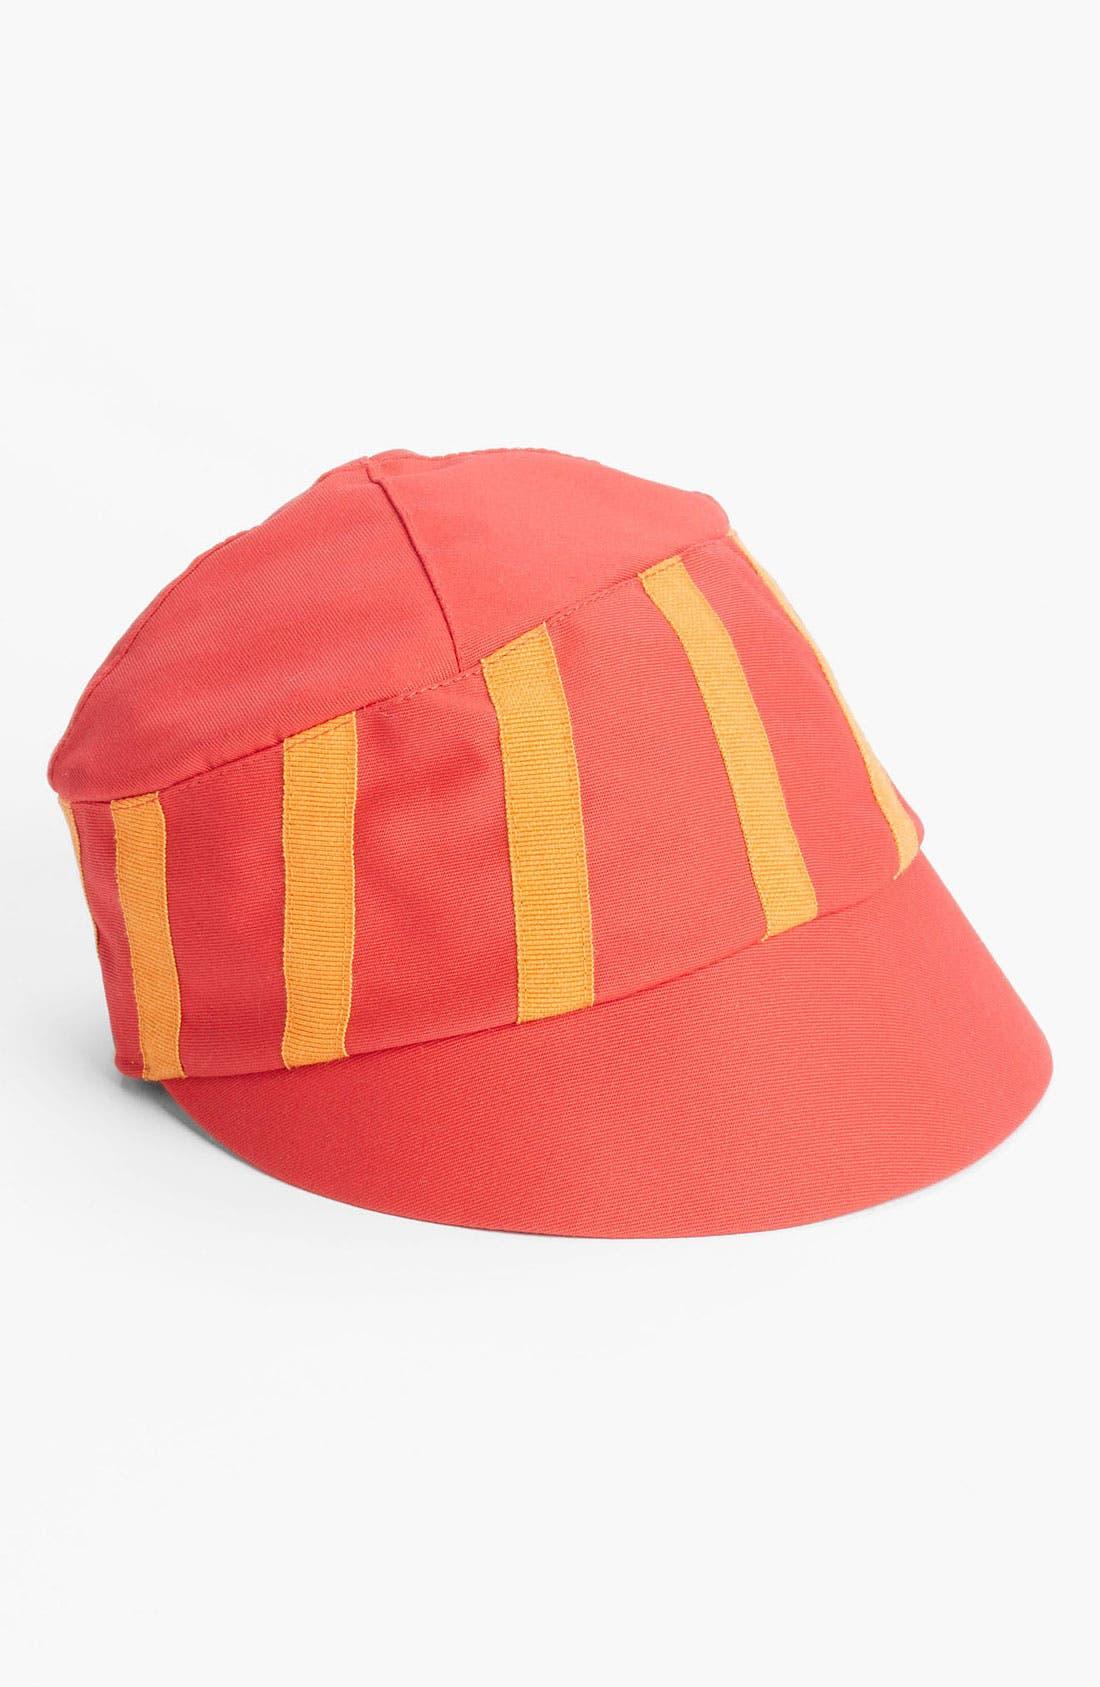 Alternate Image 1 Selected - Nordstrom Woven Hat